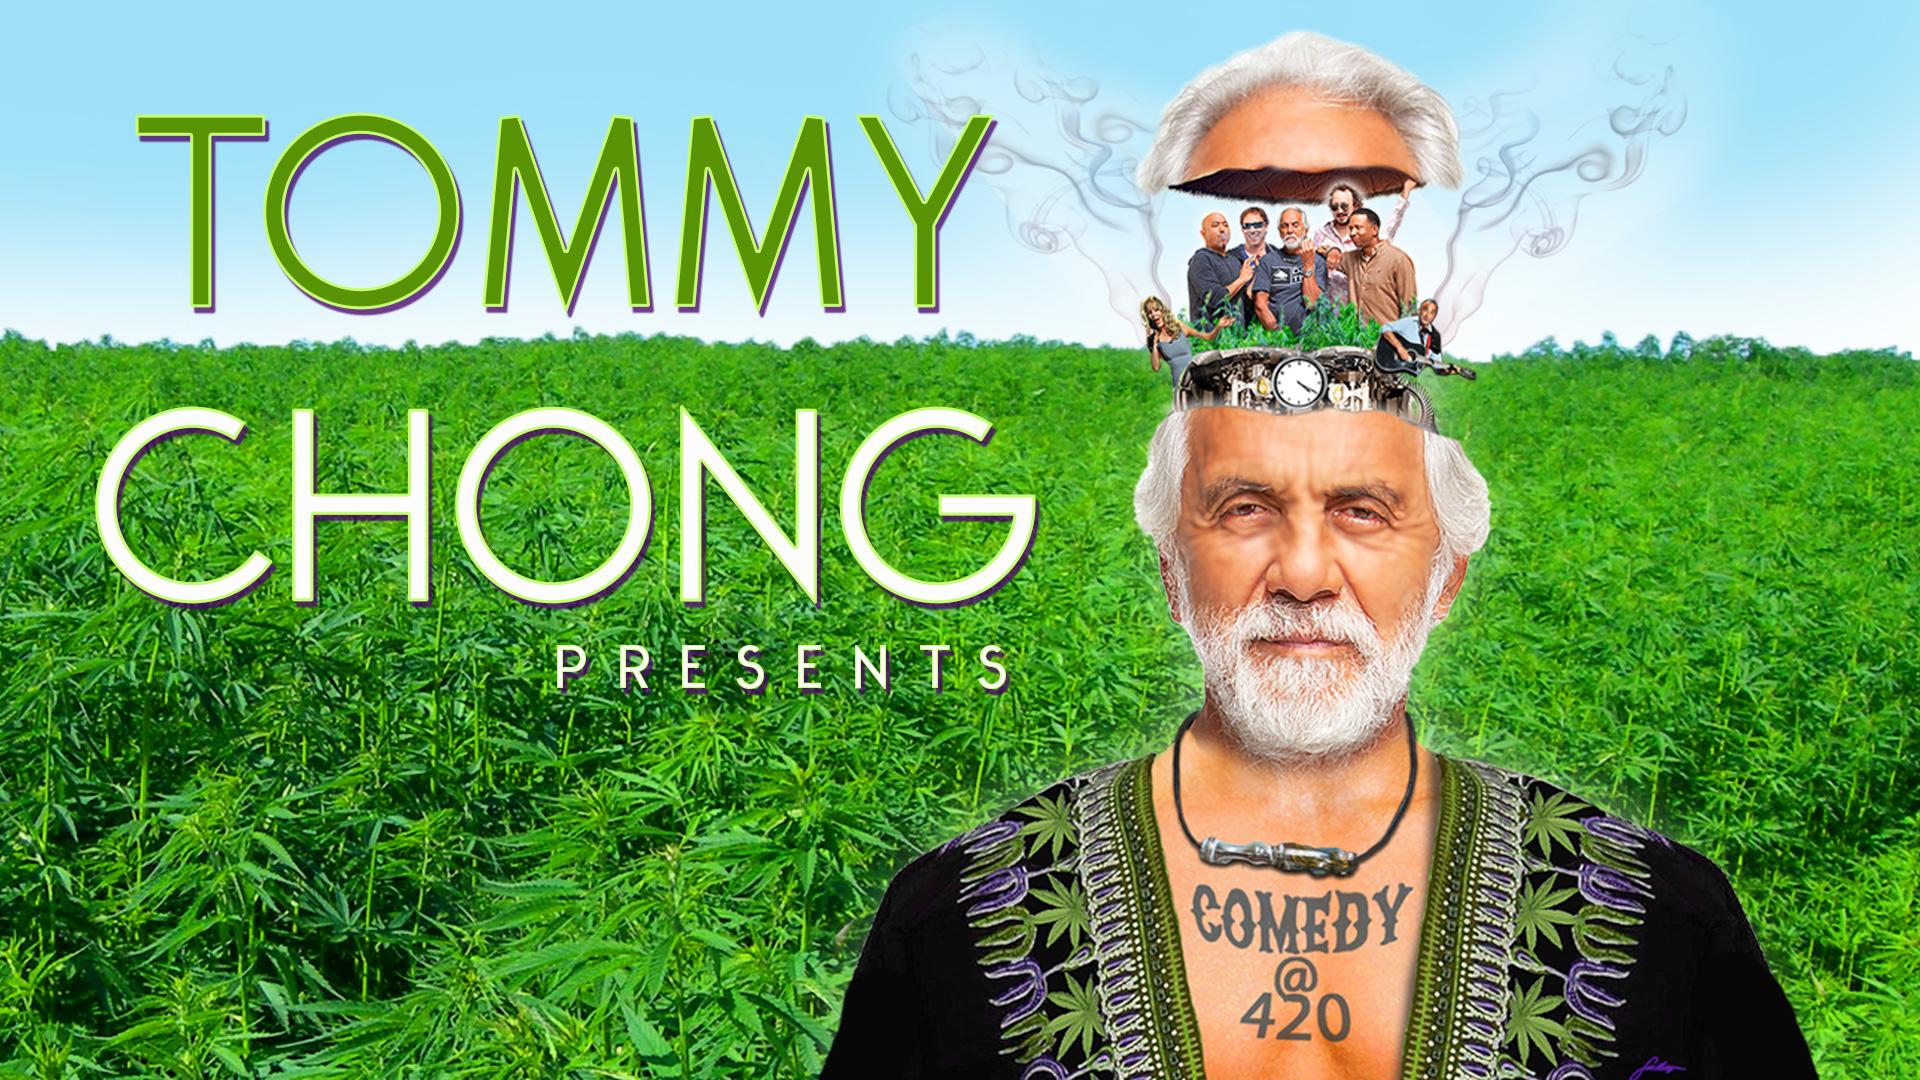 Tommy Chong Presents Comedy At 420